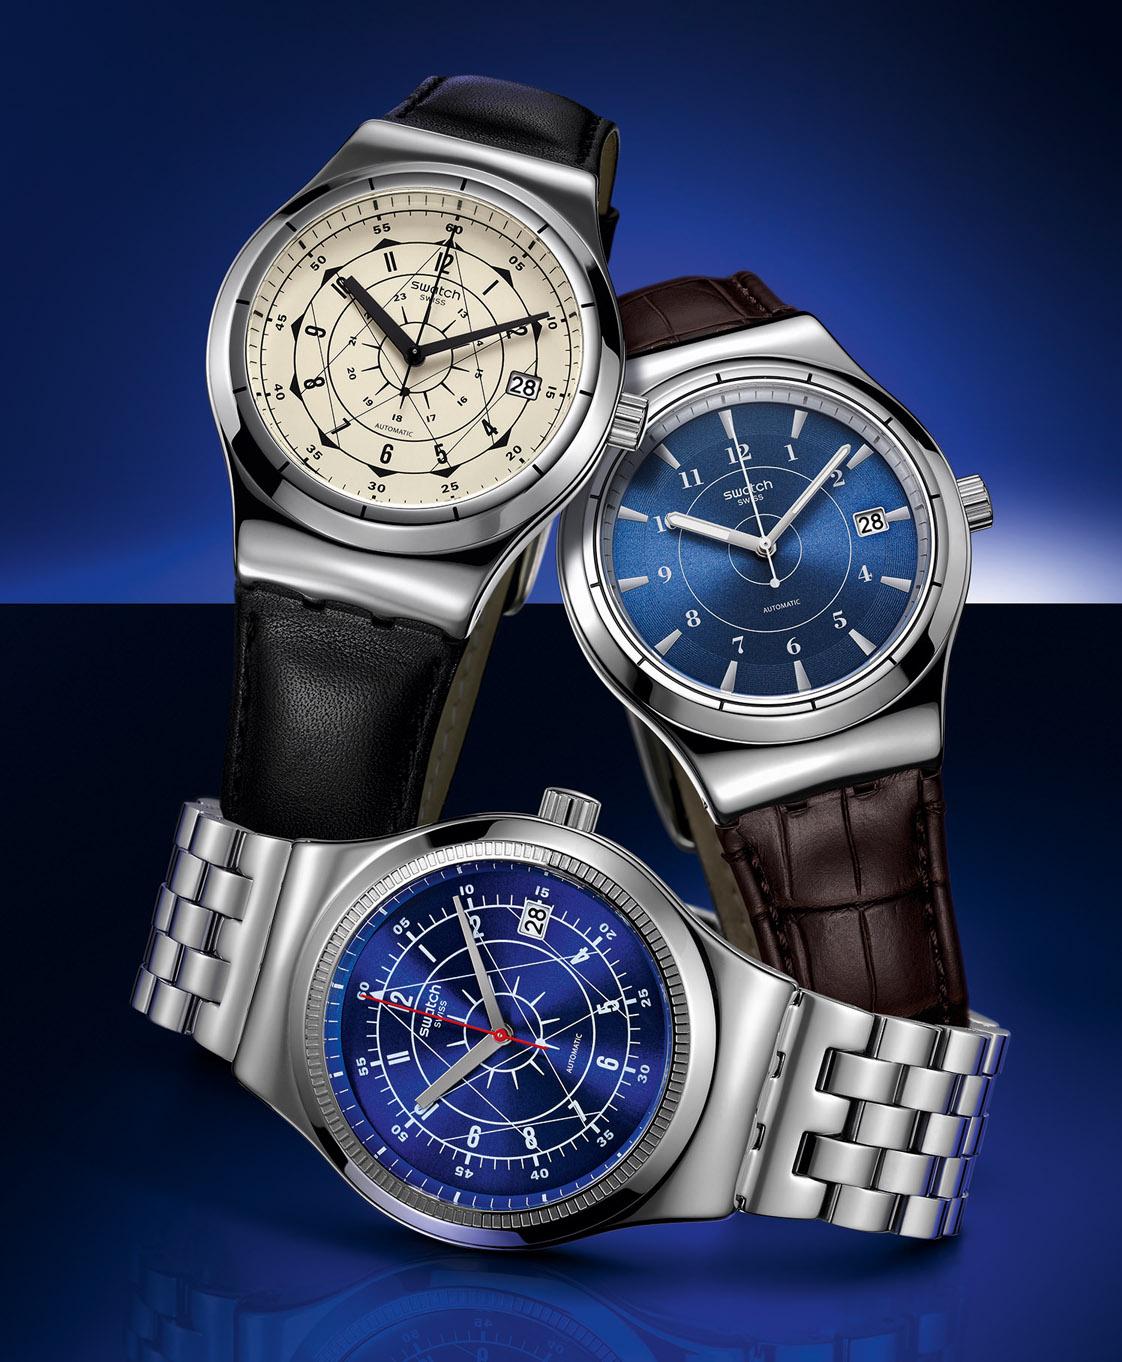 Swatch-Sistem-51-rony-Automatics-Stainless-Steel-1.jpg